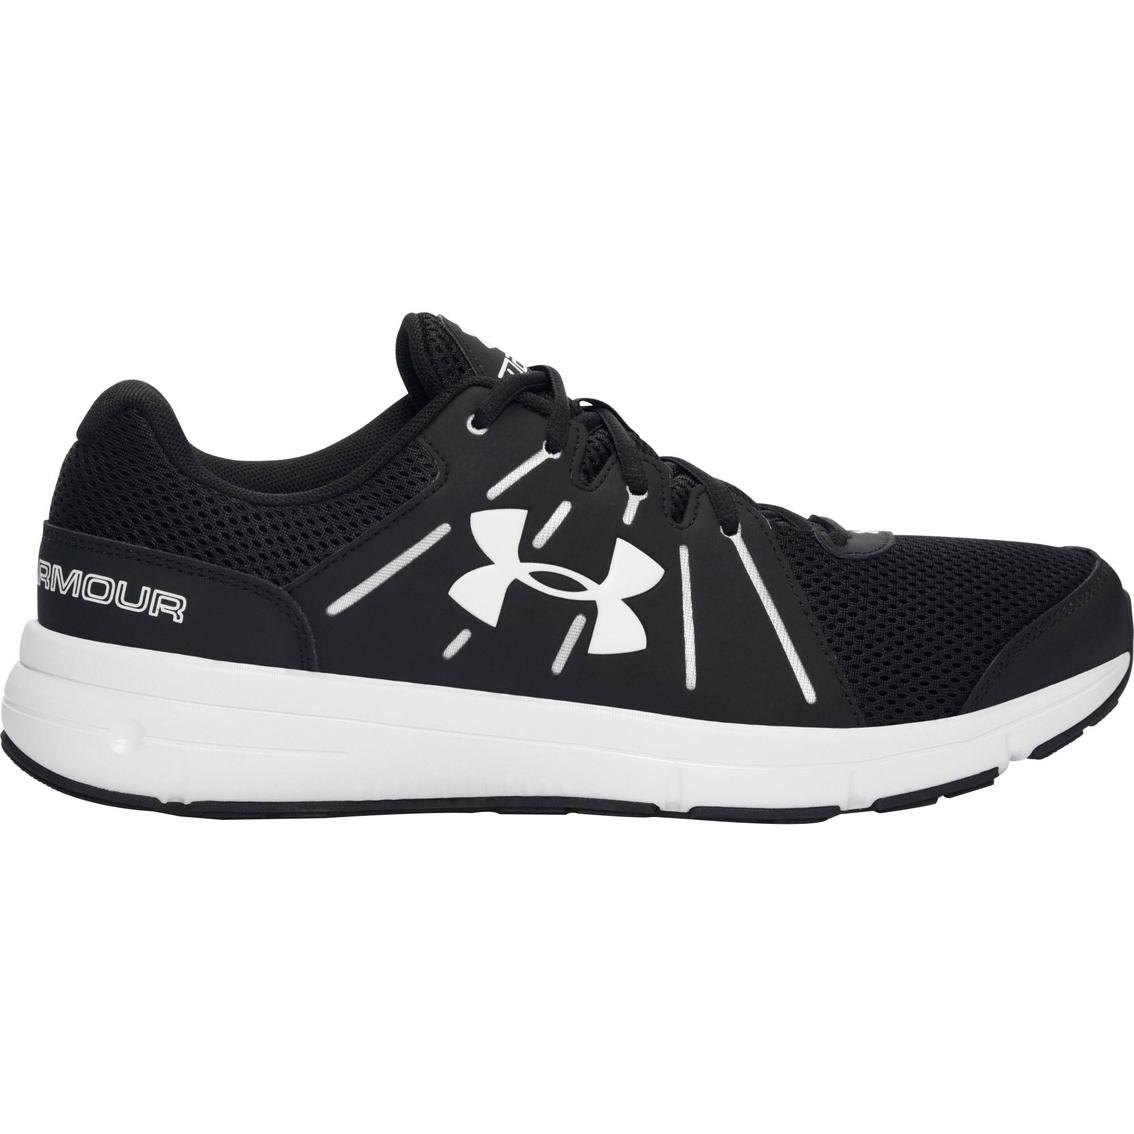 Dash Rn 2 Running Shoes   Running